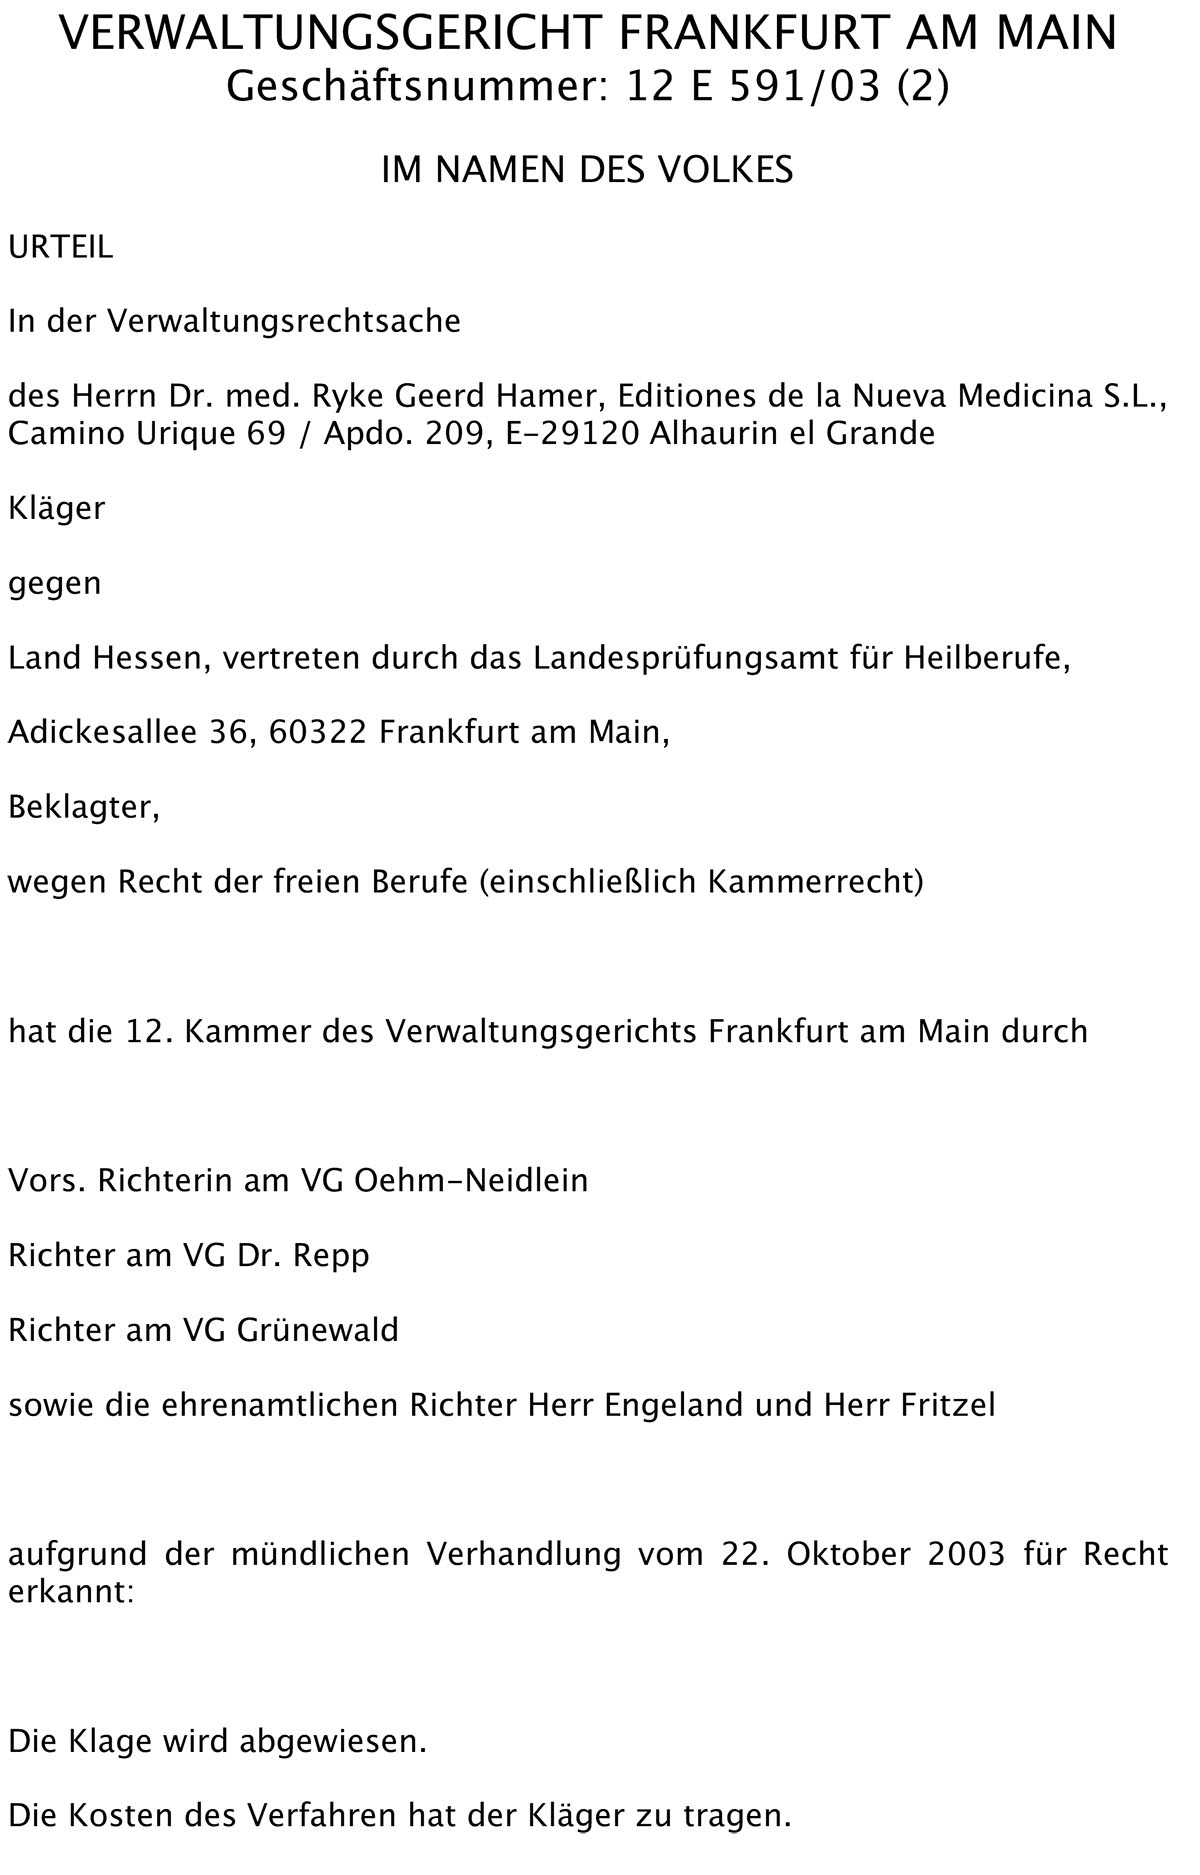 Microsoft Word - Sentenza_tribunale_amministrativo_di_Francofort